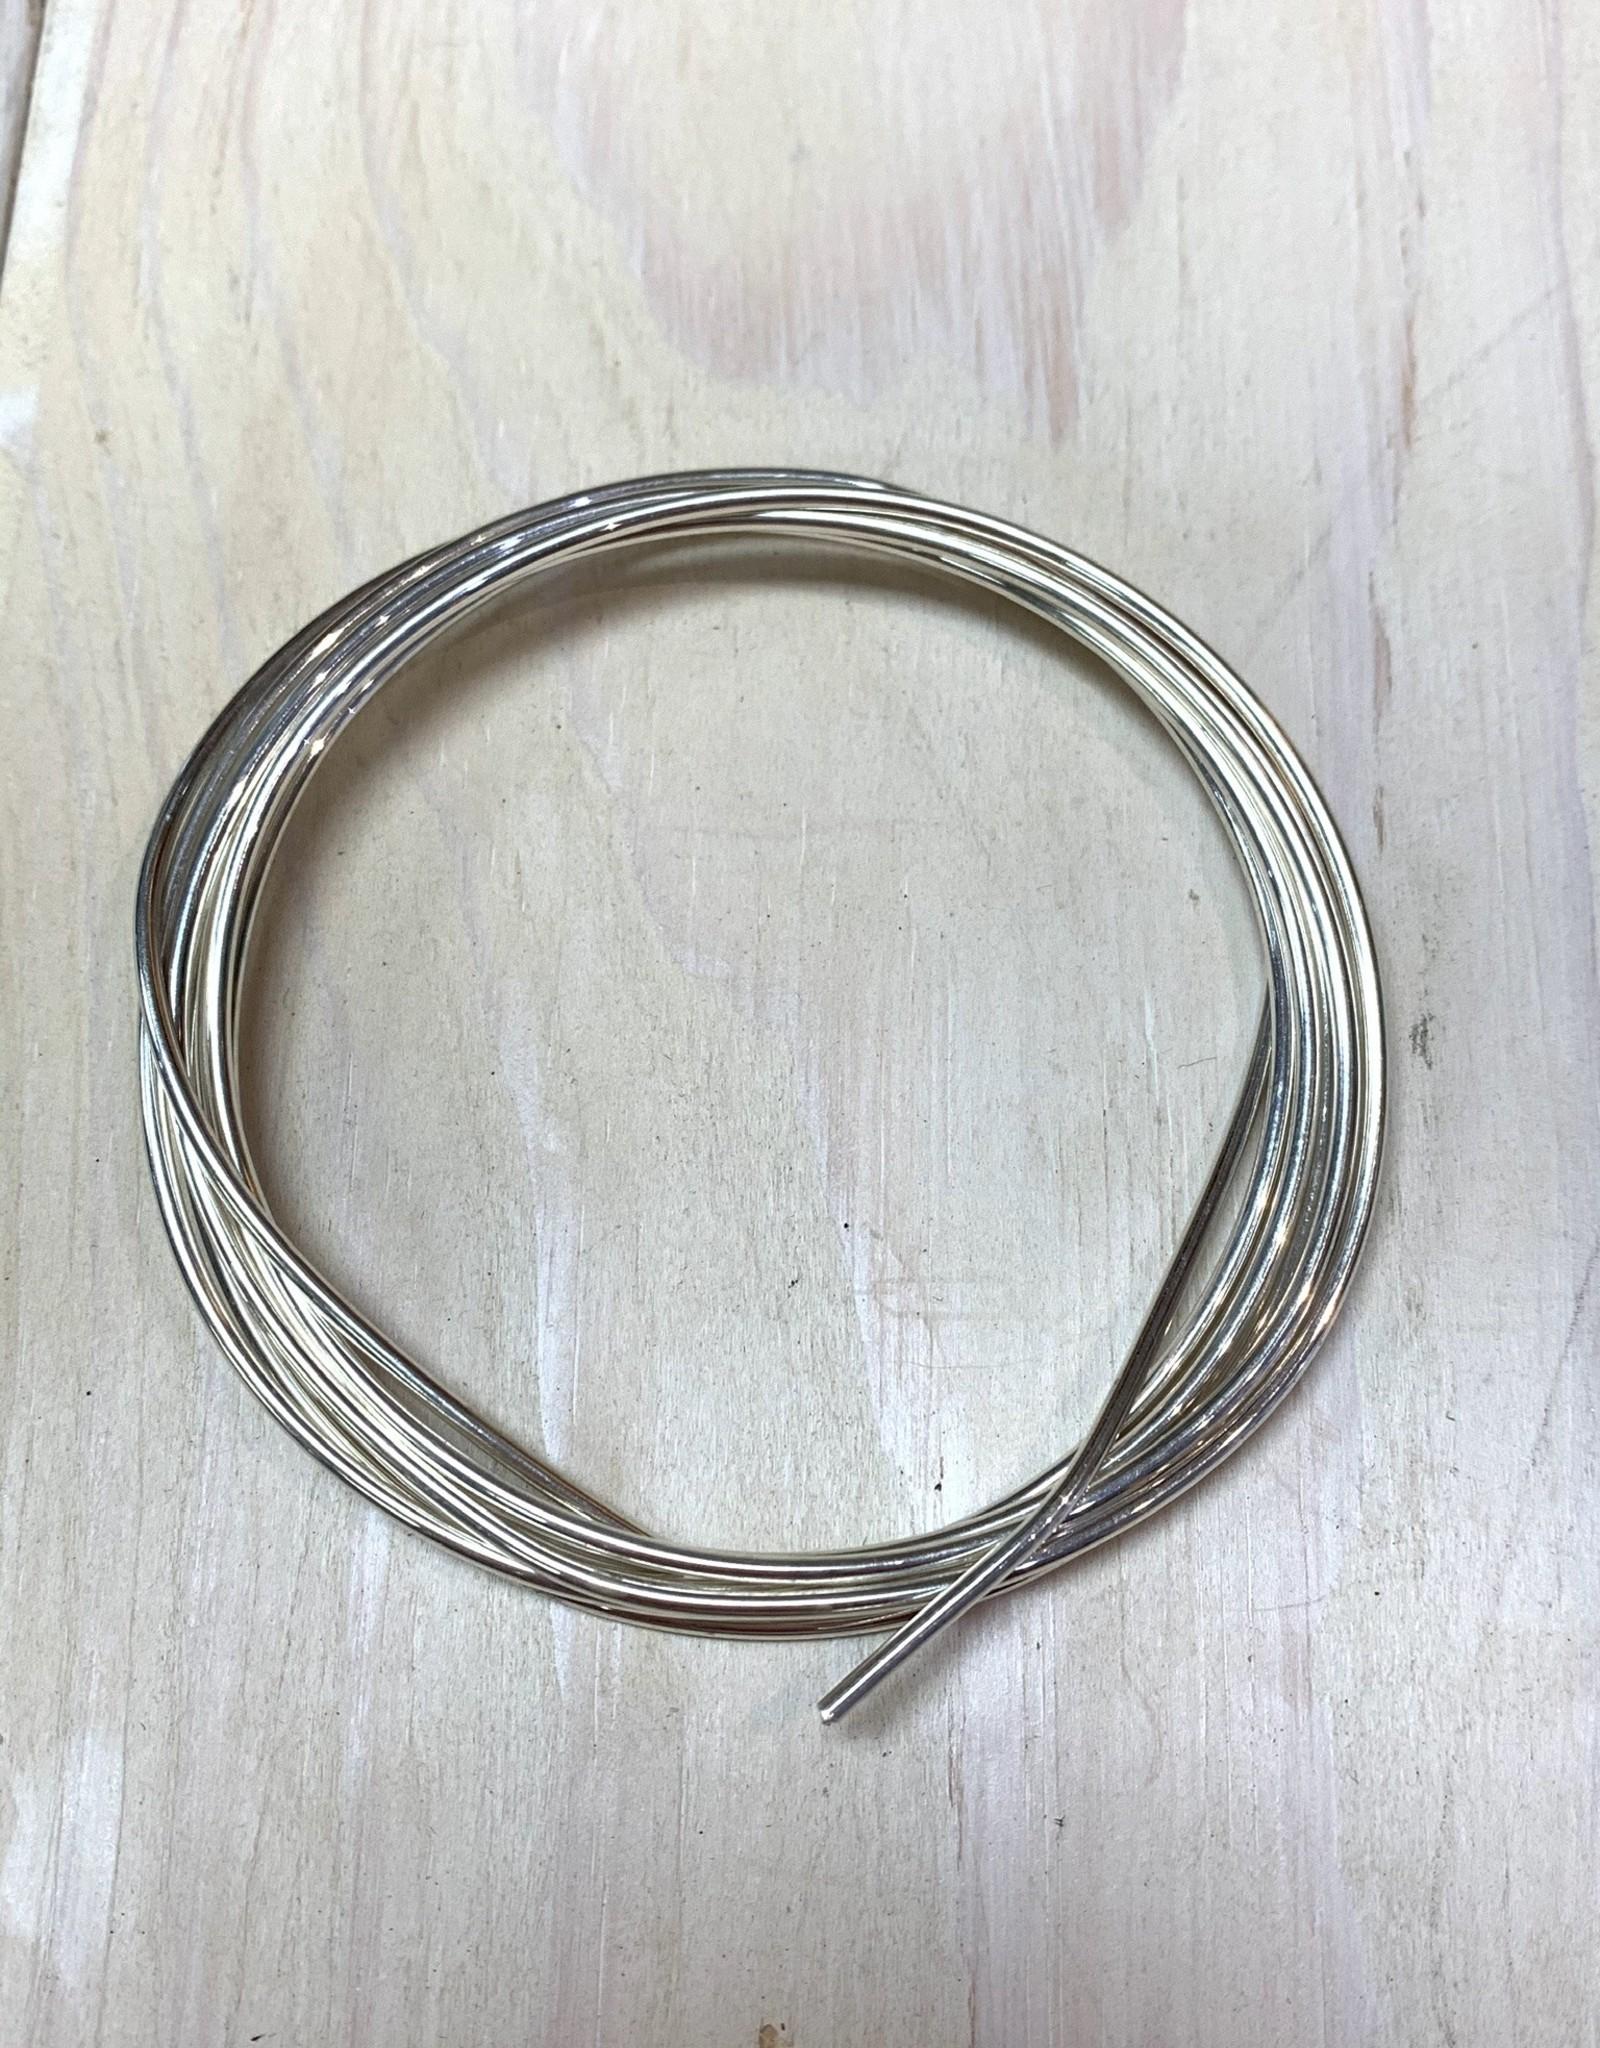 14ga Round Wire Sterling Silver 1oz DS